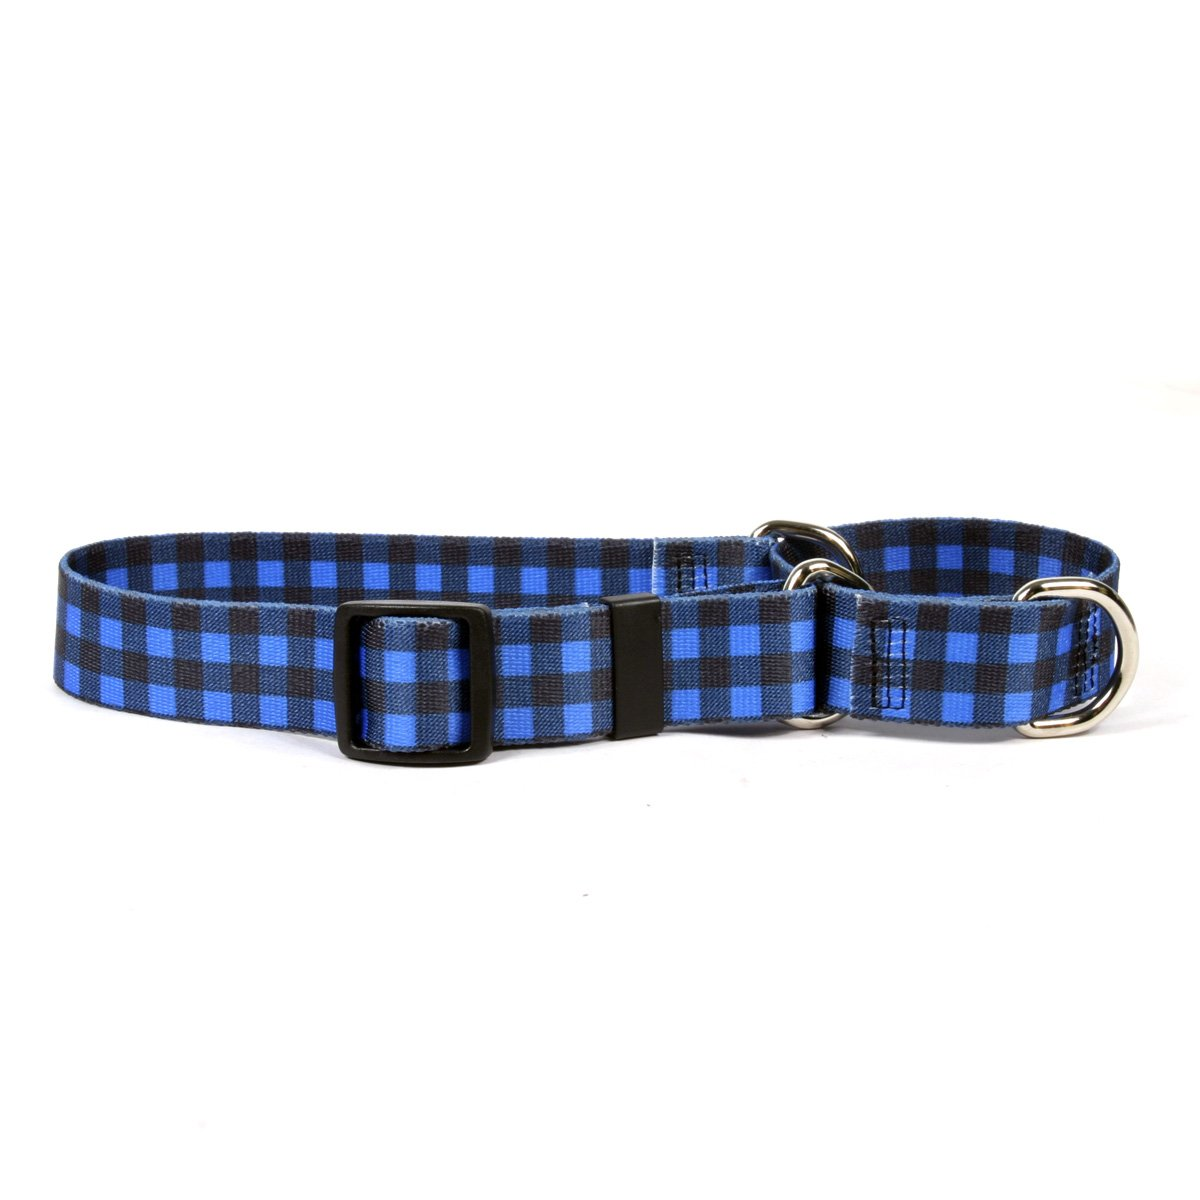 Yellow Dog Design Buffalo Plaid Blue Martingale Dog Collar Large BUFB133